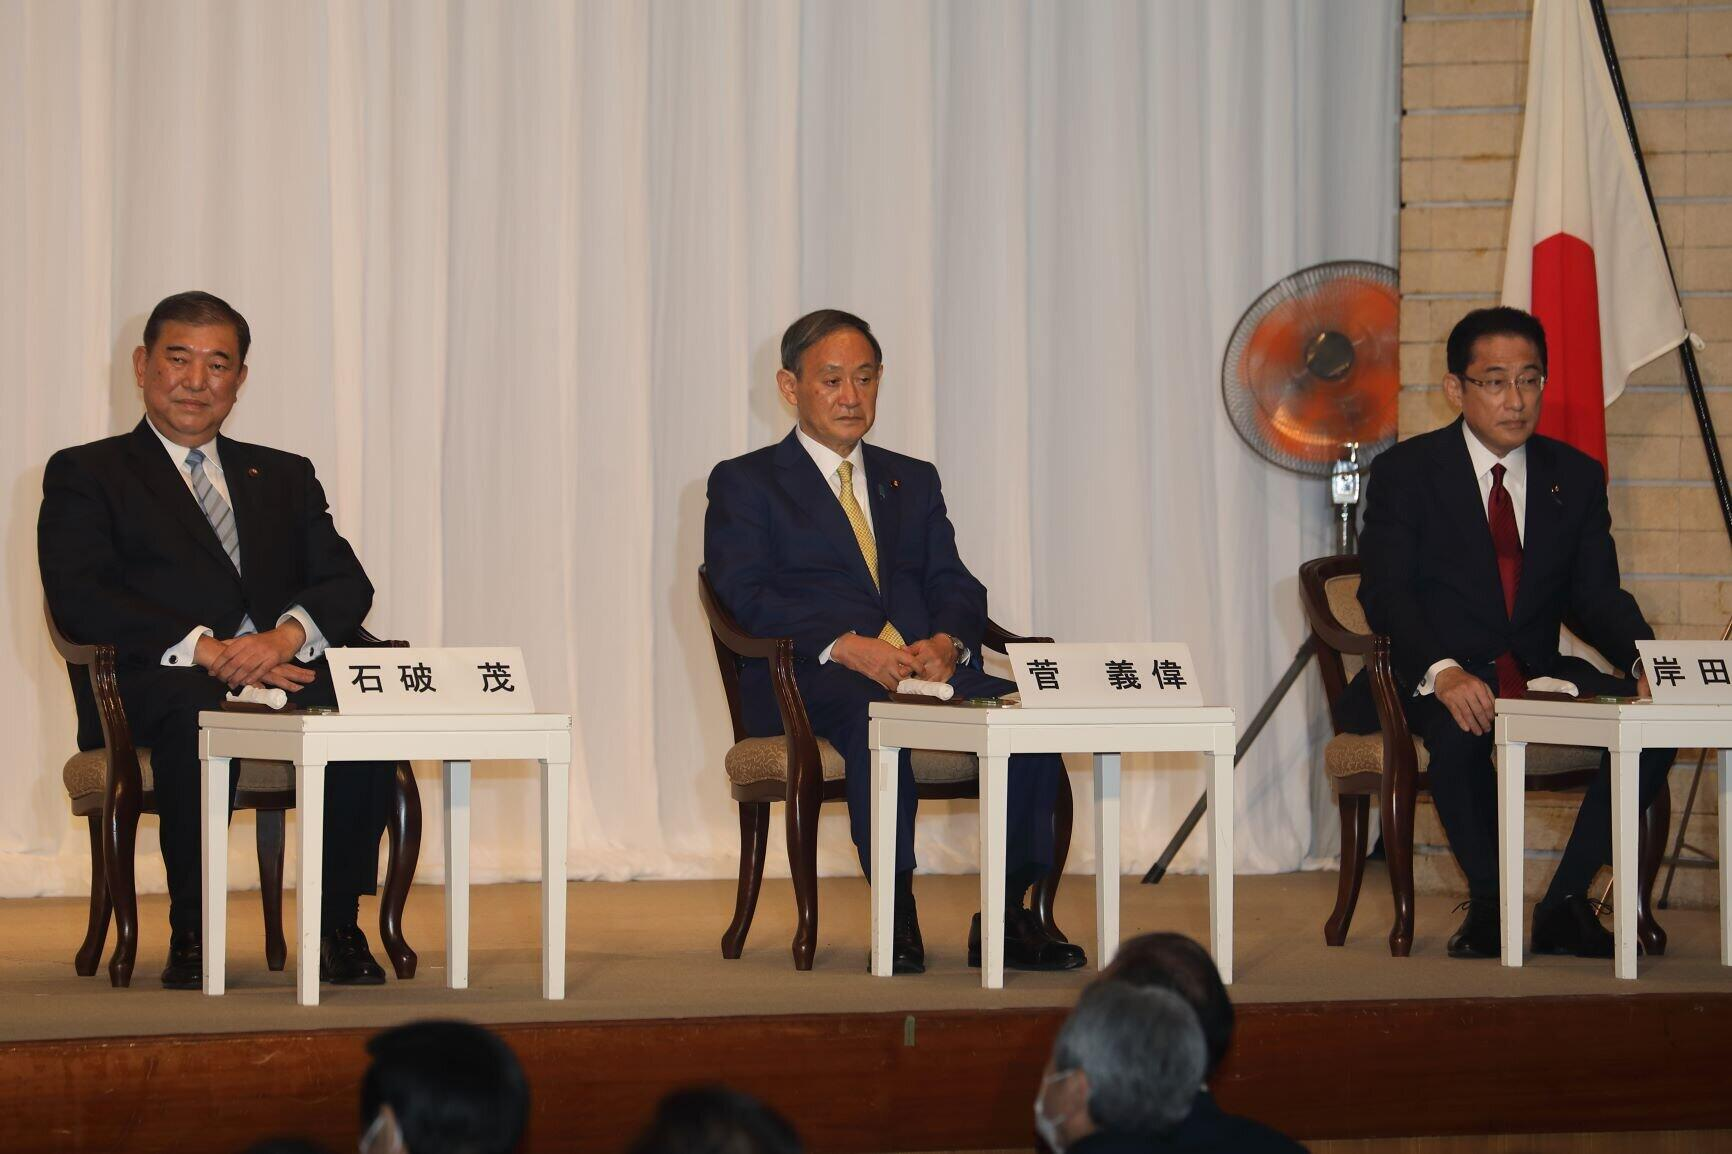 自民党総裁選の演説会に臨む3候補(2020年9月8日、東京都千代田区)